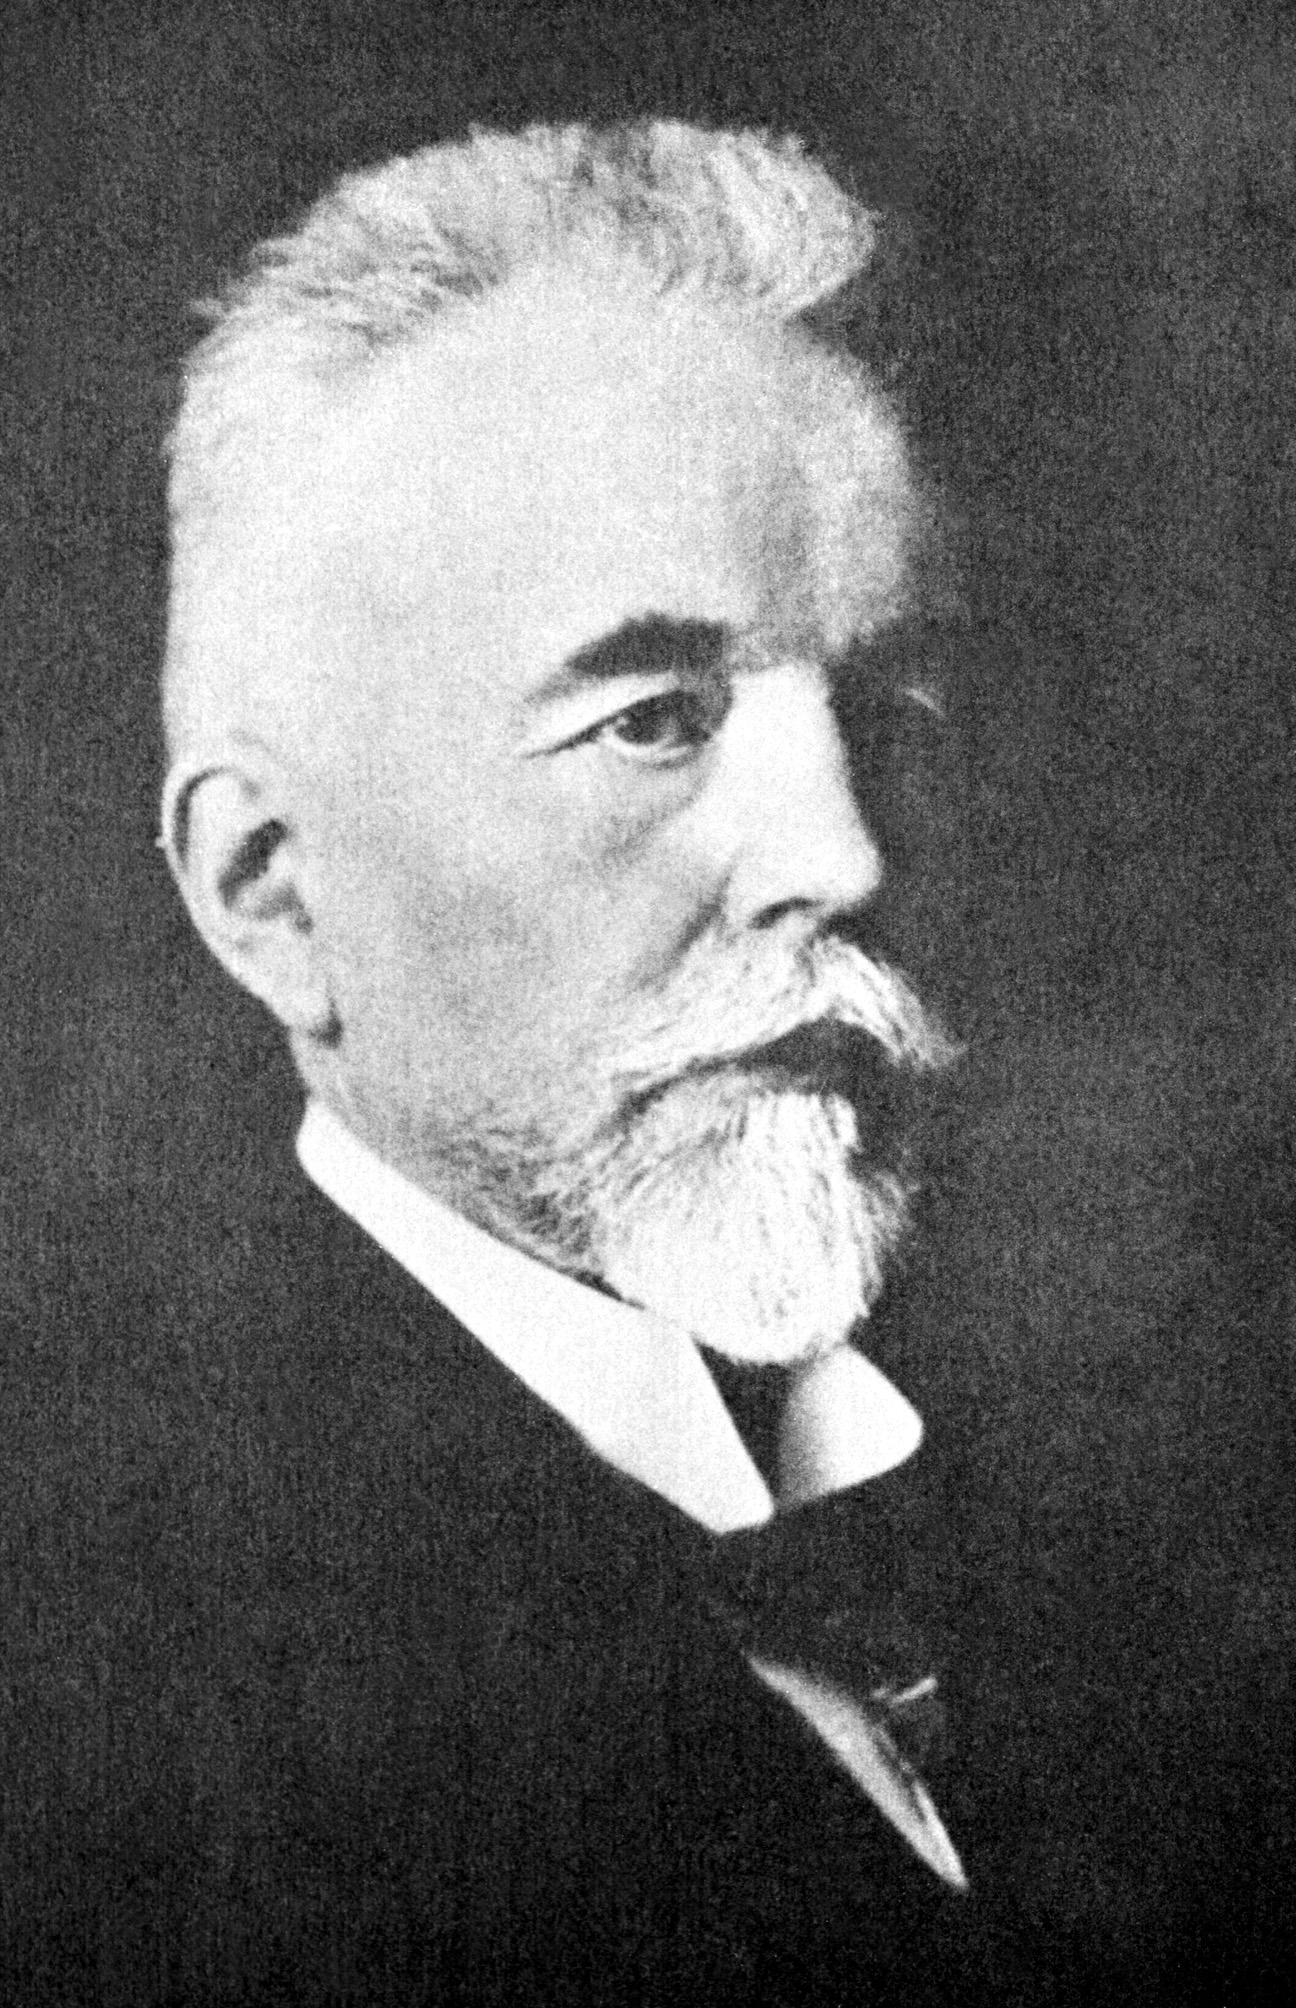 Aurel Stodola